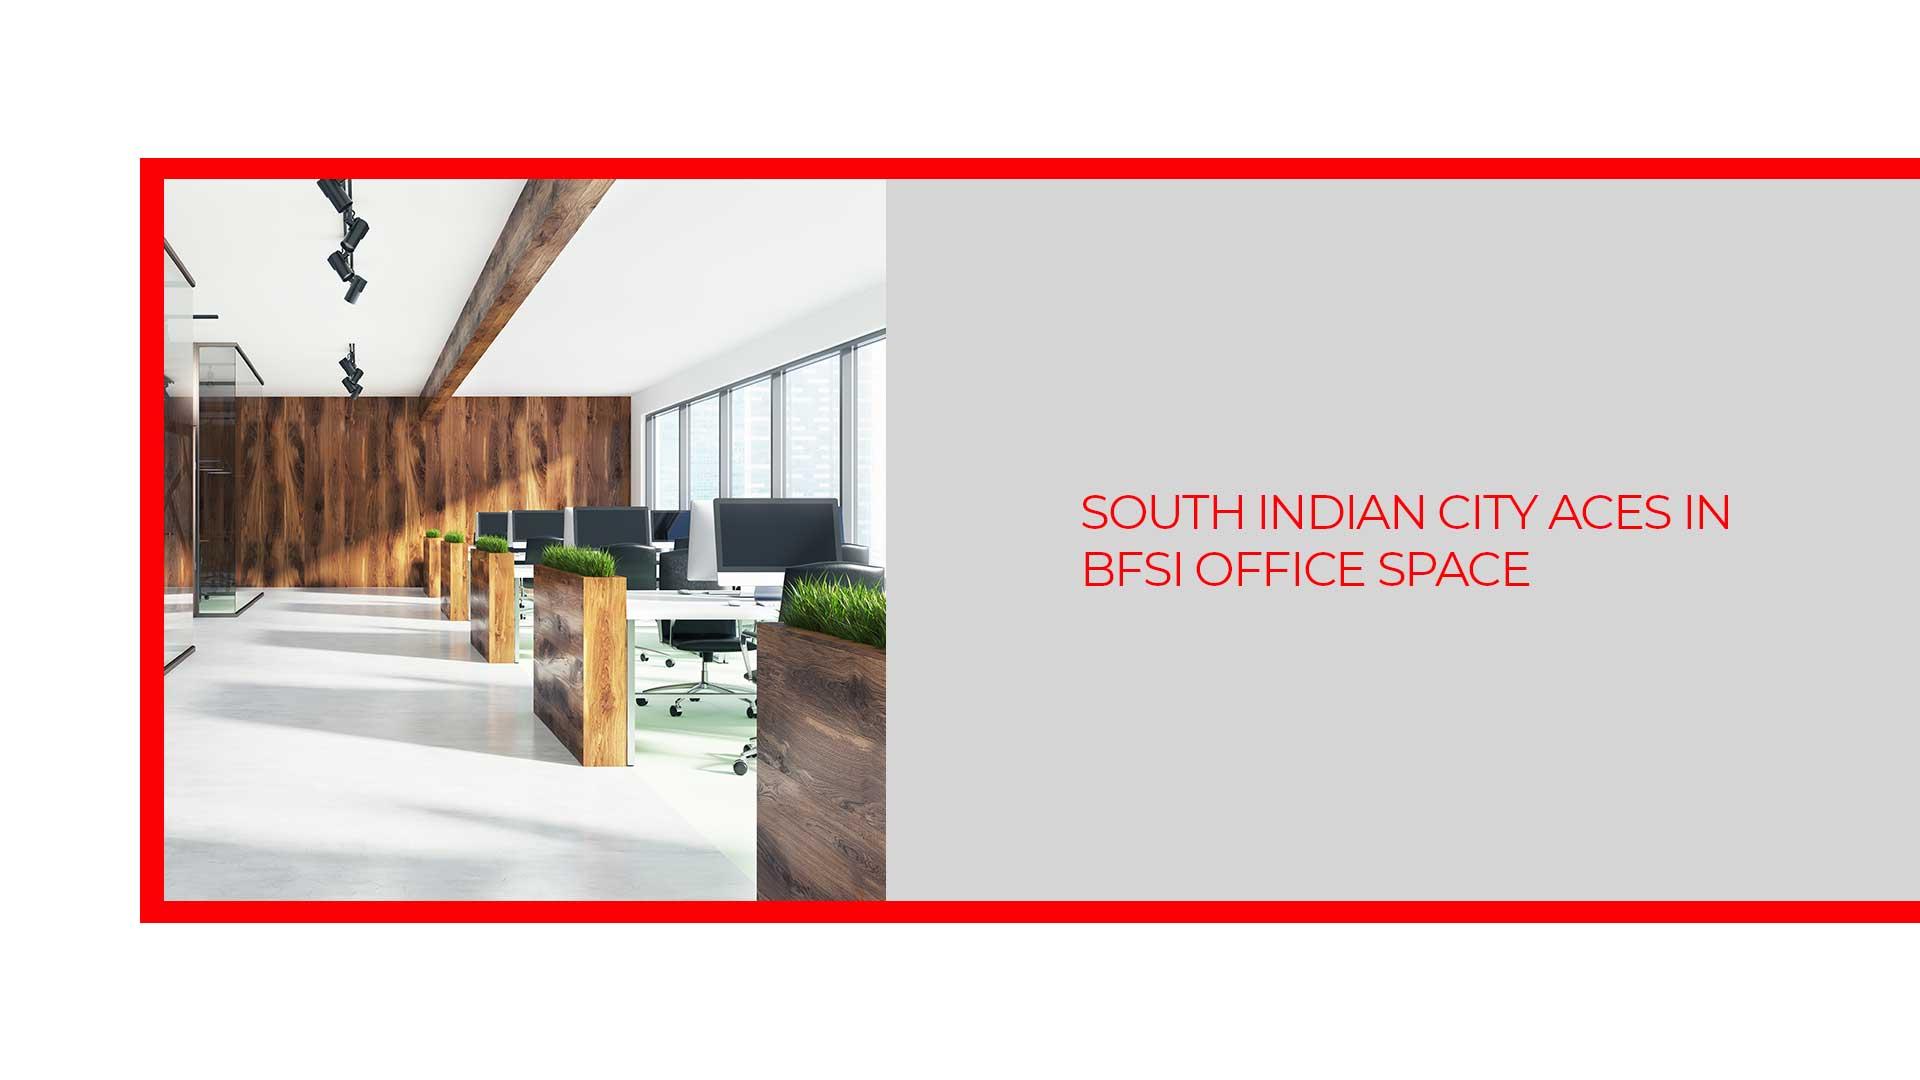 Bengaluru leads in acquiring BFSI office space in India